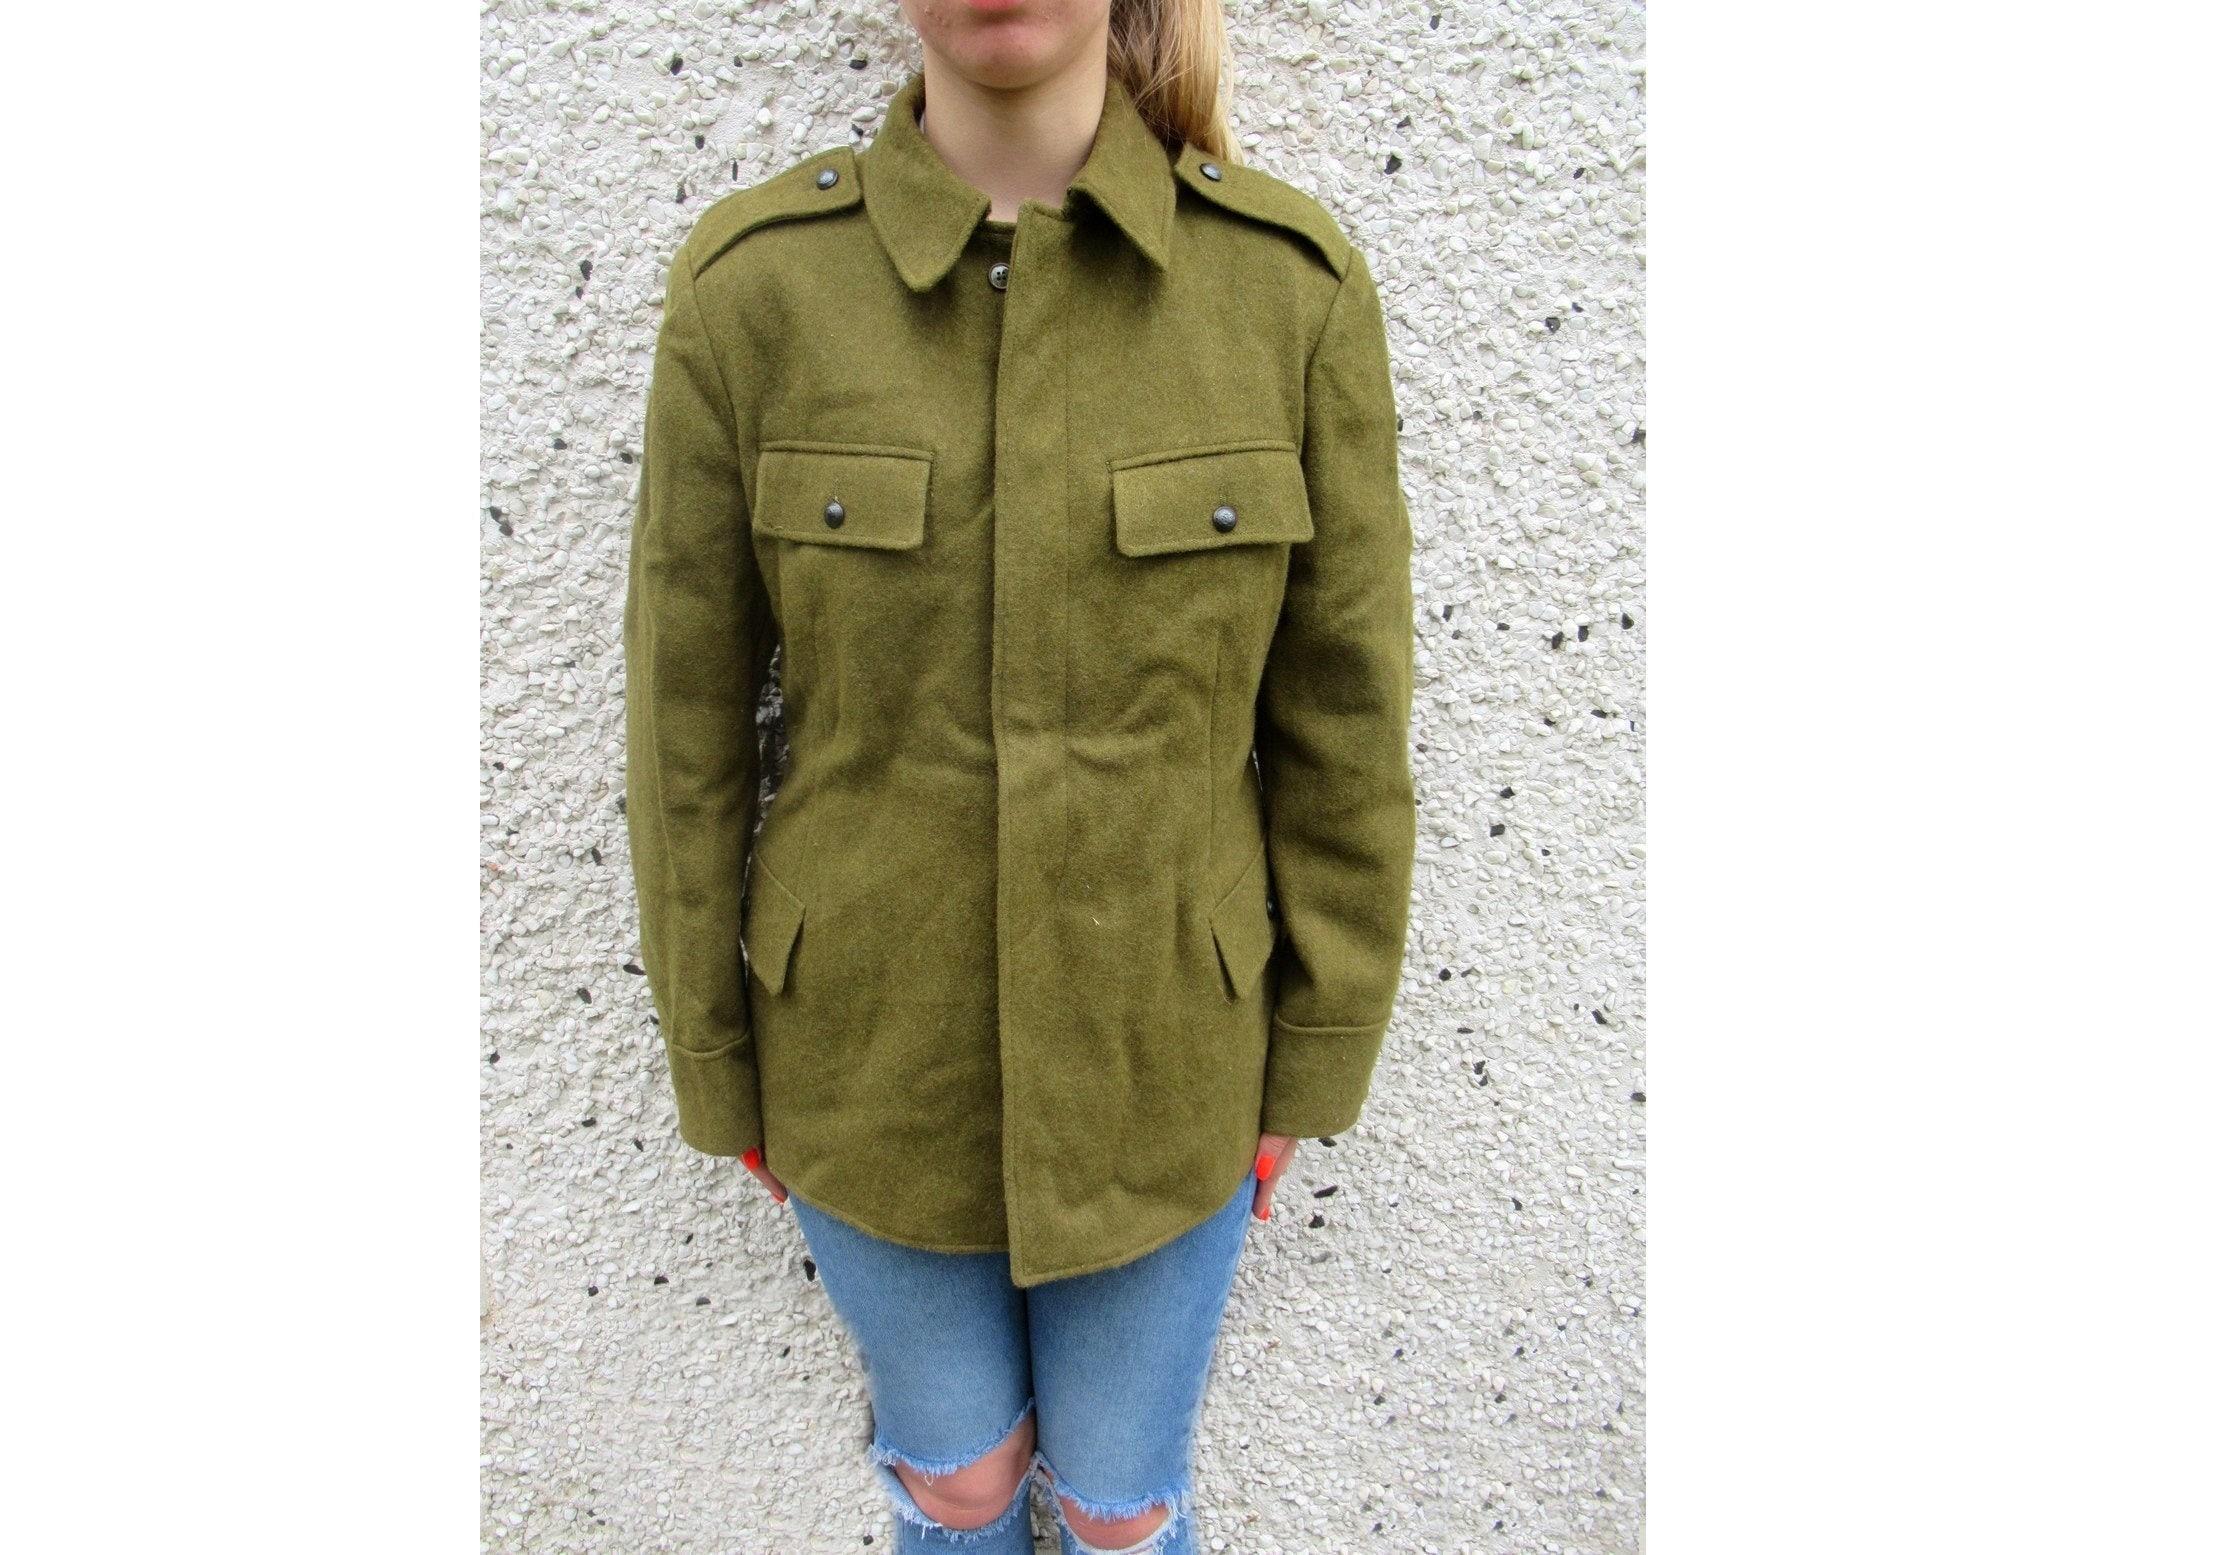 beee1c8195 Vintage Soviet Era Romanian Women's wool military jeep jacket blazer coat  army retro uniform communist